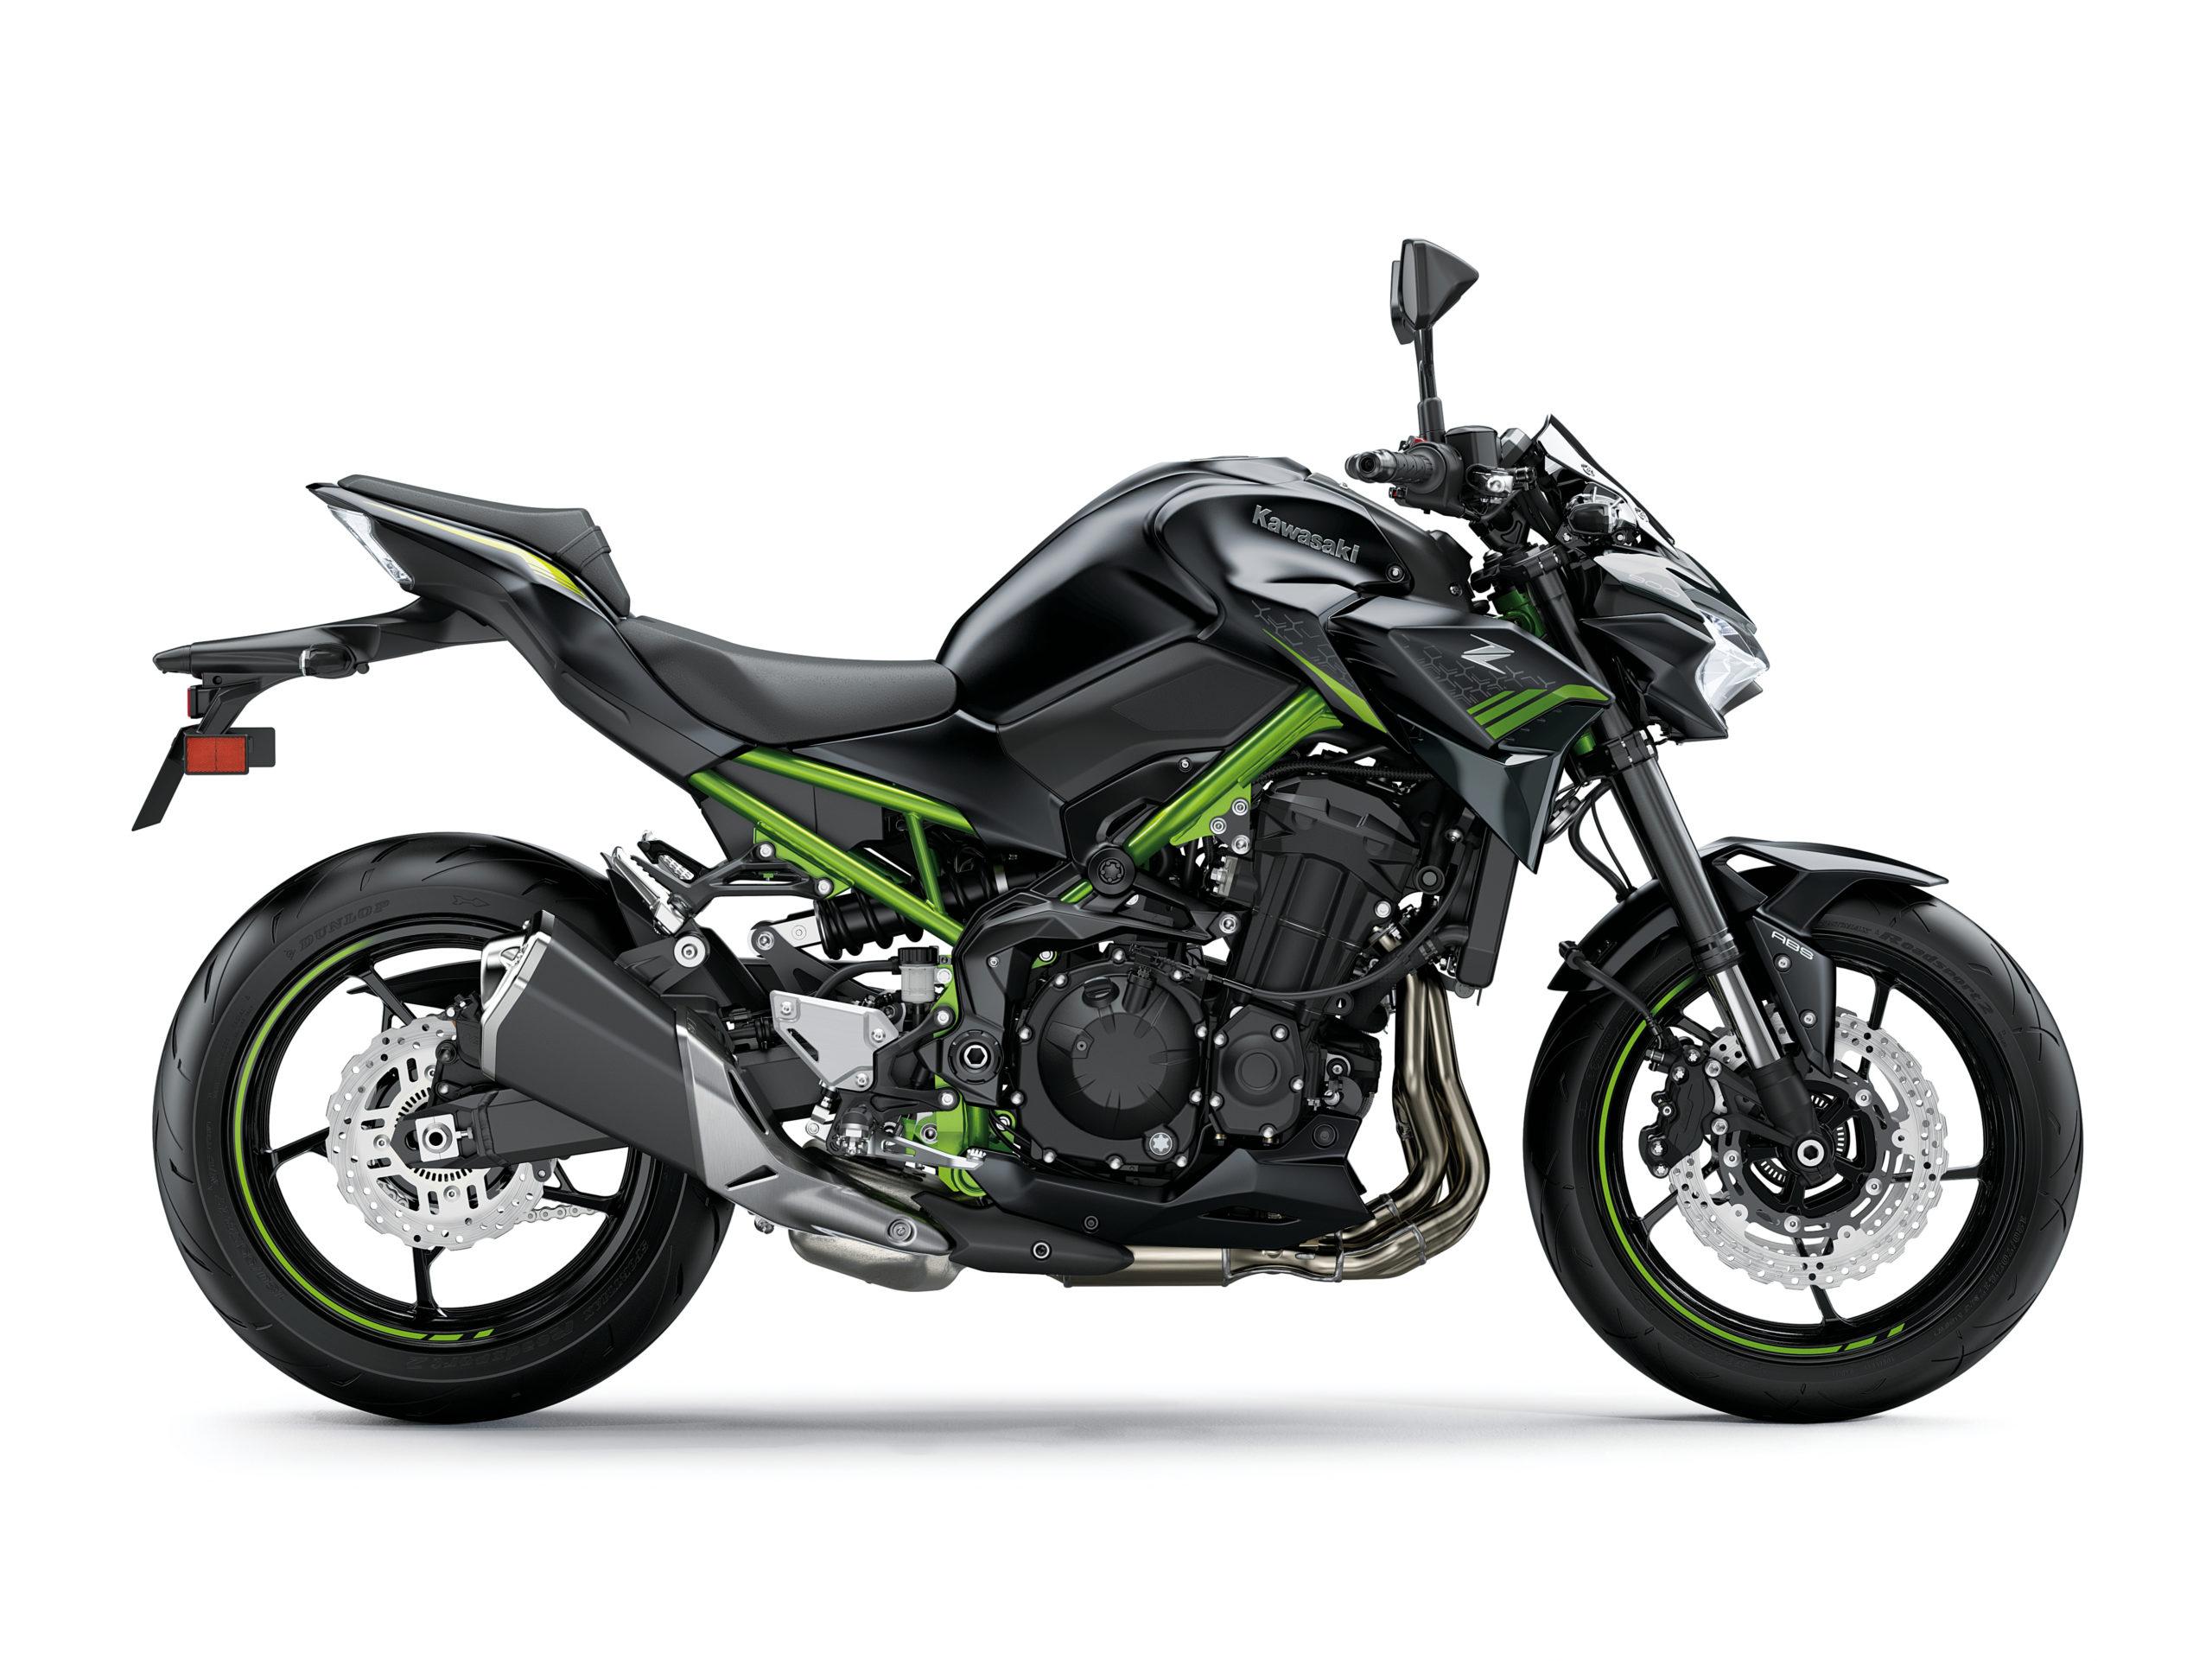 Z900 2021 Noir et vert